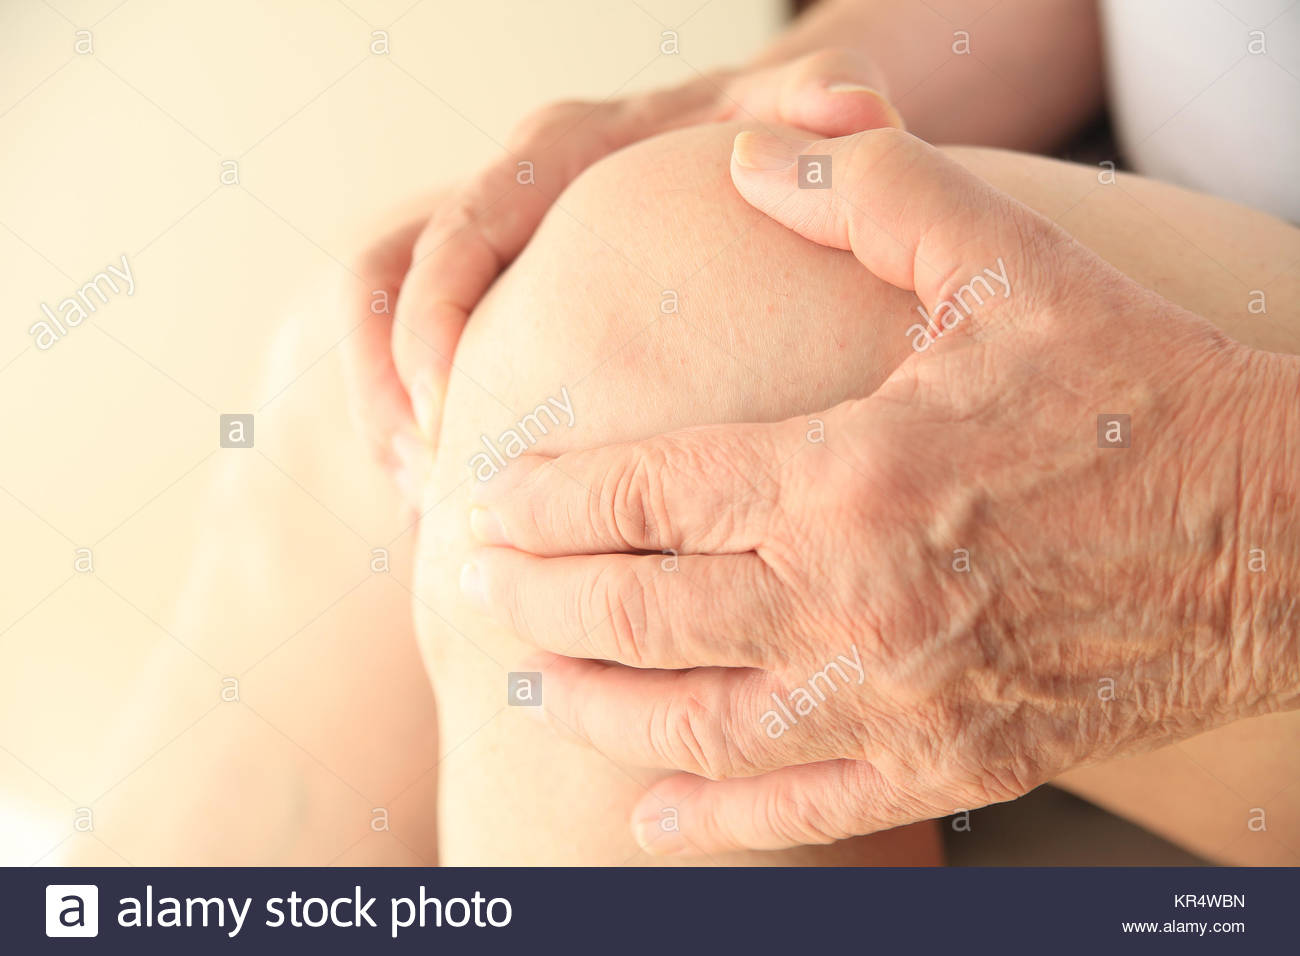 Closeup of senior man with soreness in knee - Stock Image